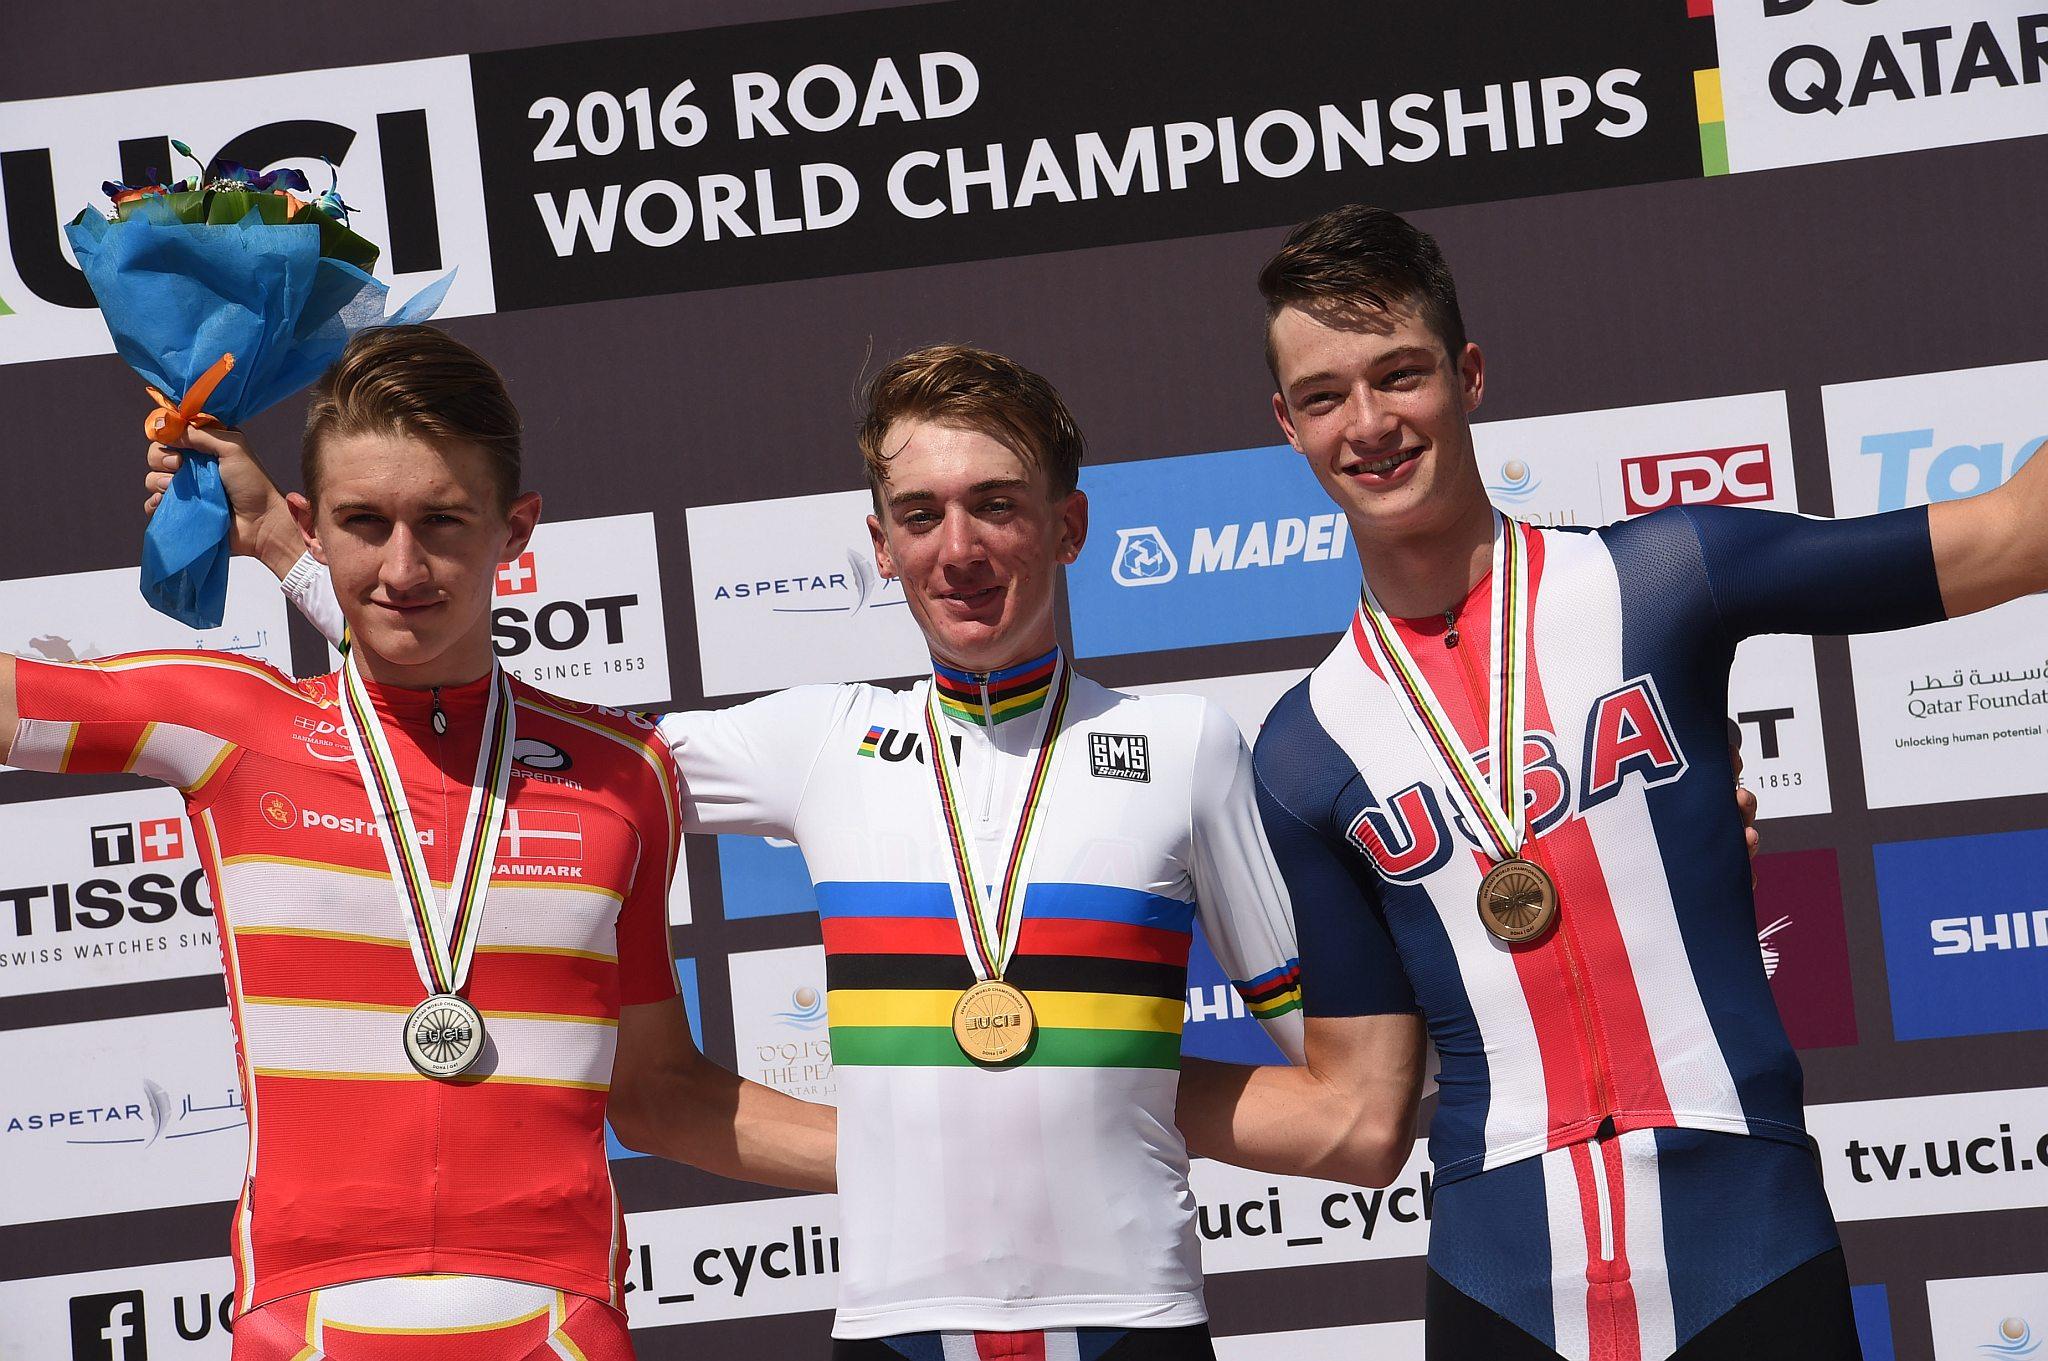 11-10-2016 World Championships Junior Man Cronometro; 2016, Usa; 2016, Danimarca; Mcnulty, Brandon; Garrison, Ian; Bjerg, Mikkel; Doha;